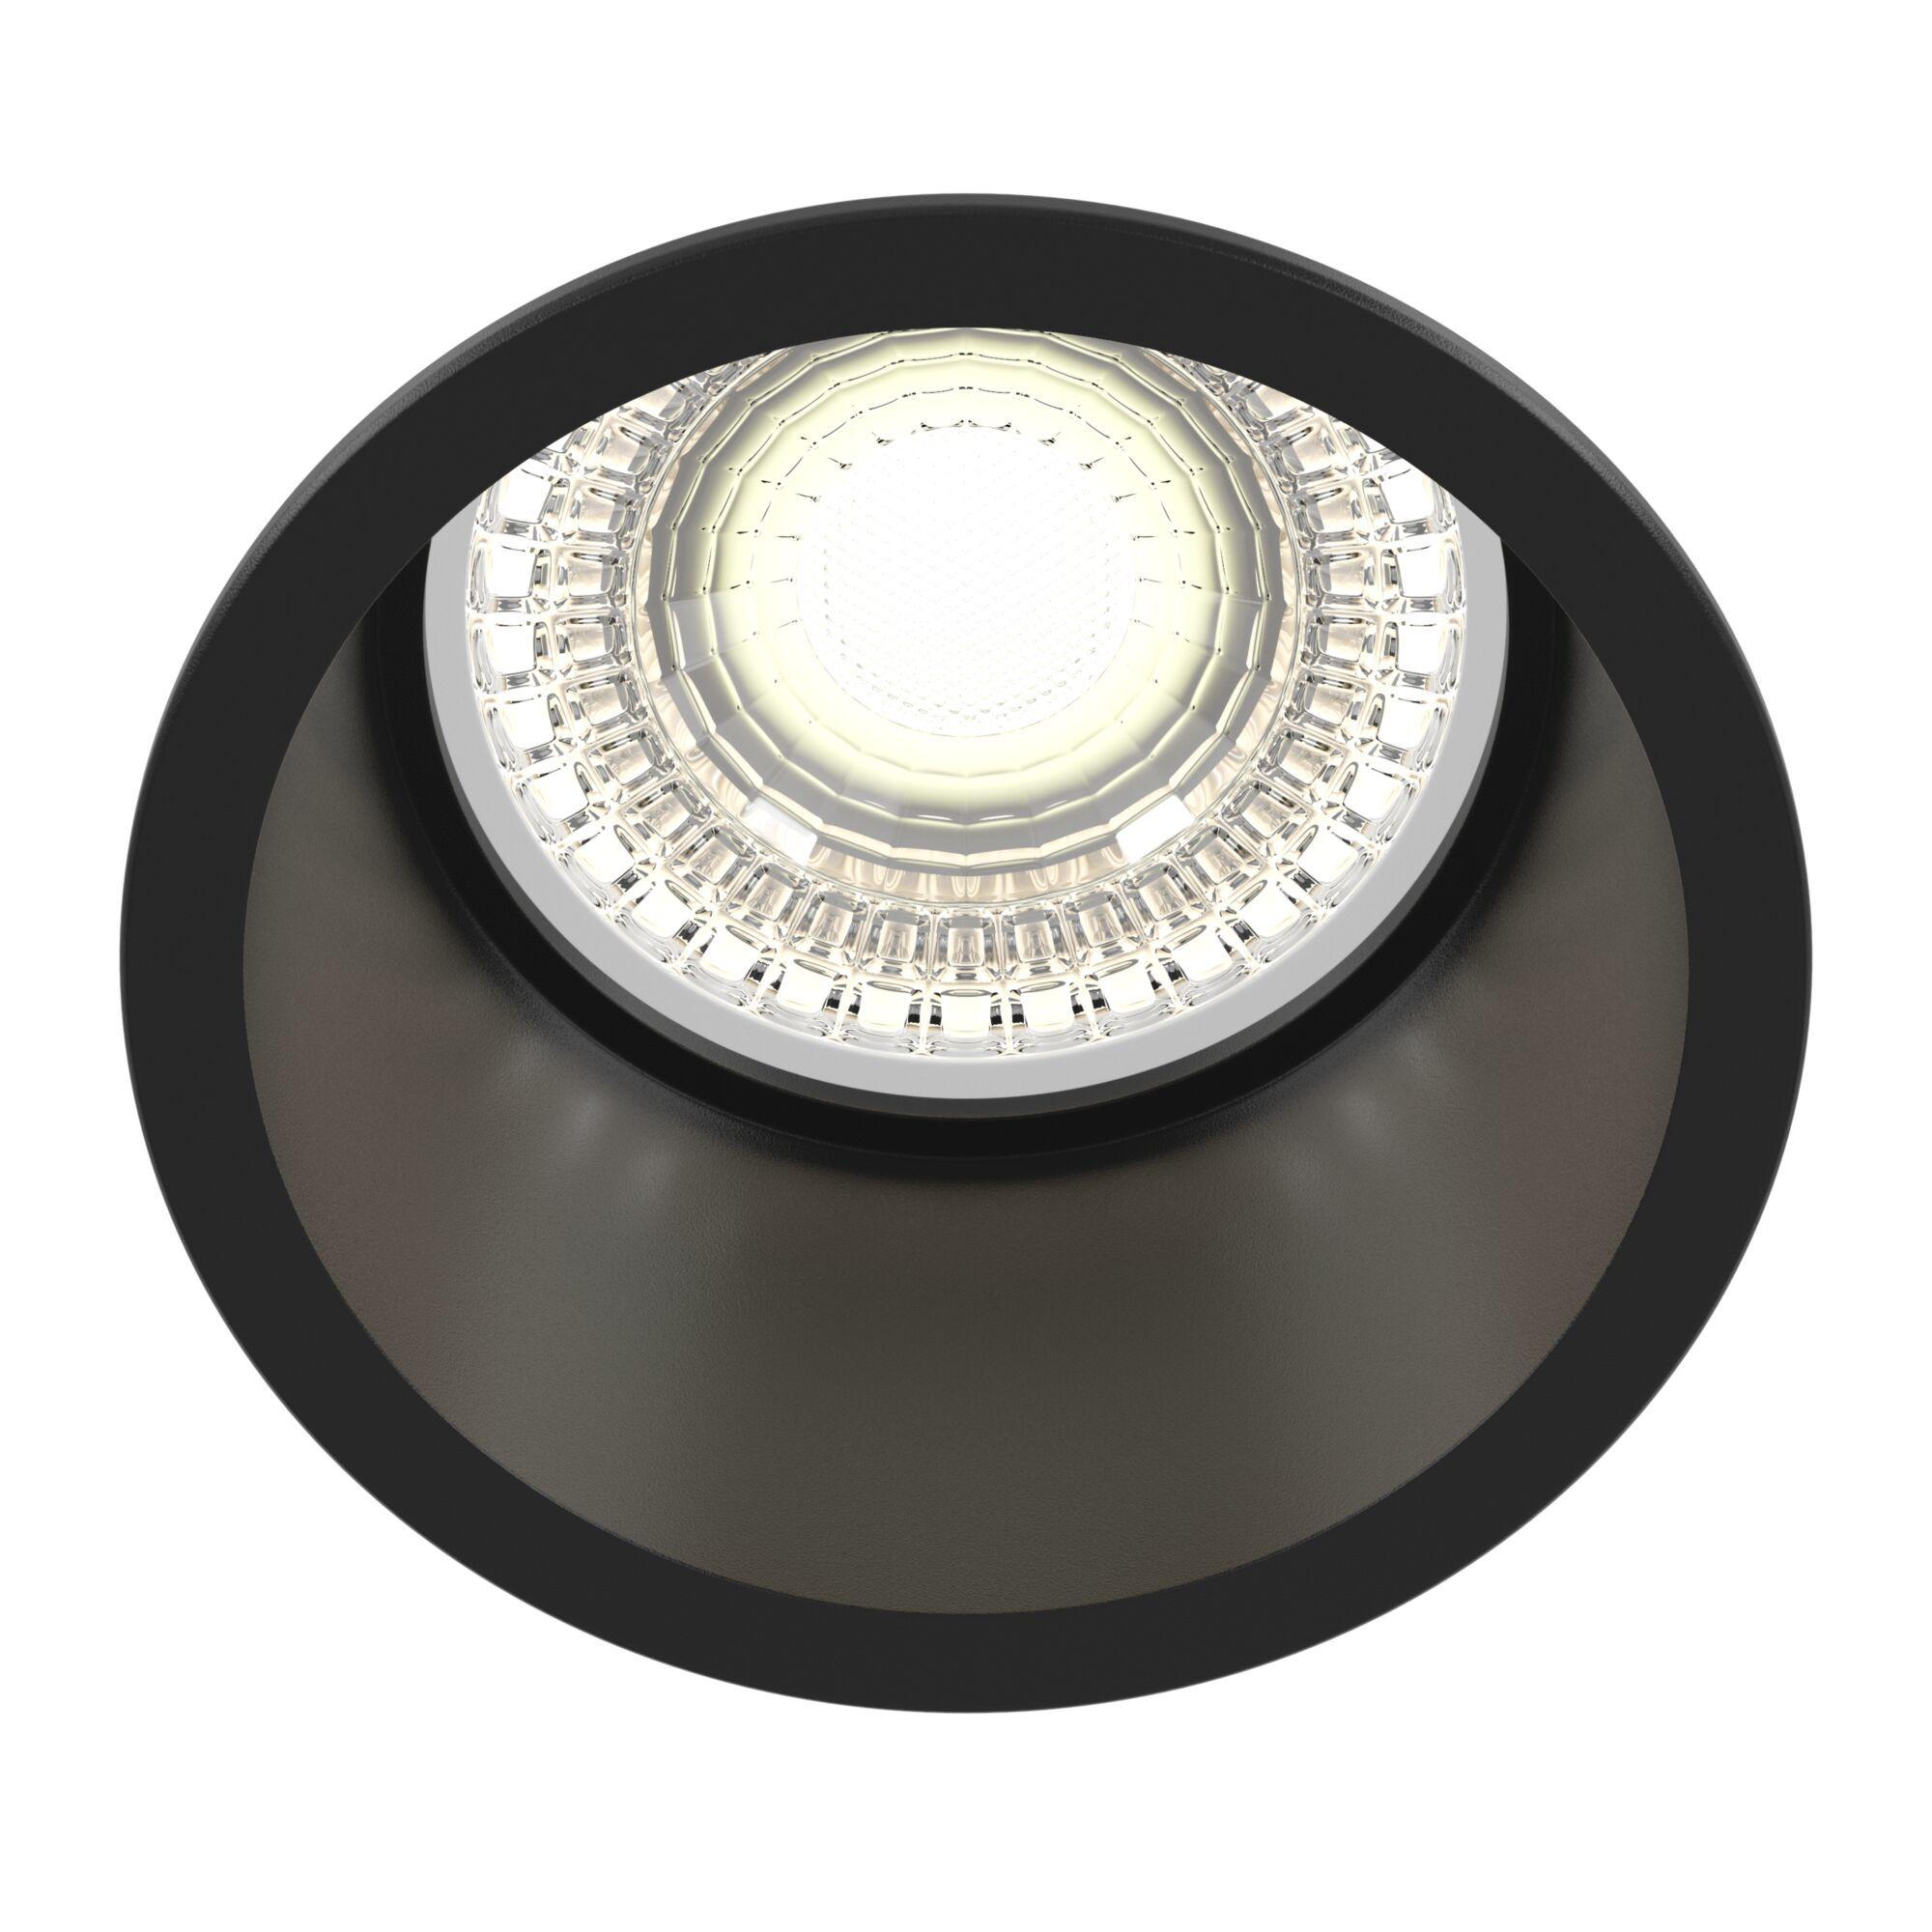 Светильник Maytoni Reif DL049-01B, 1xGU10x50W, черный, металл - фото 1